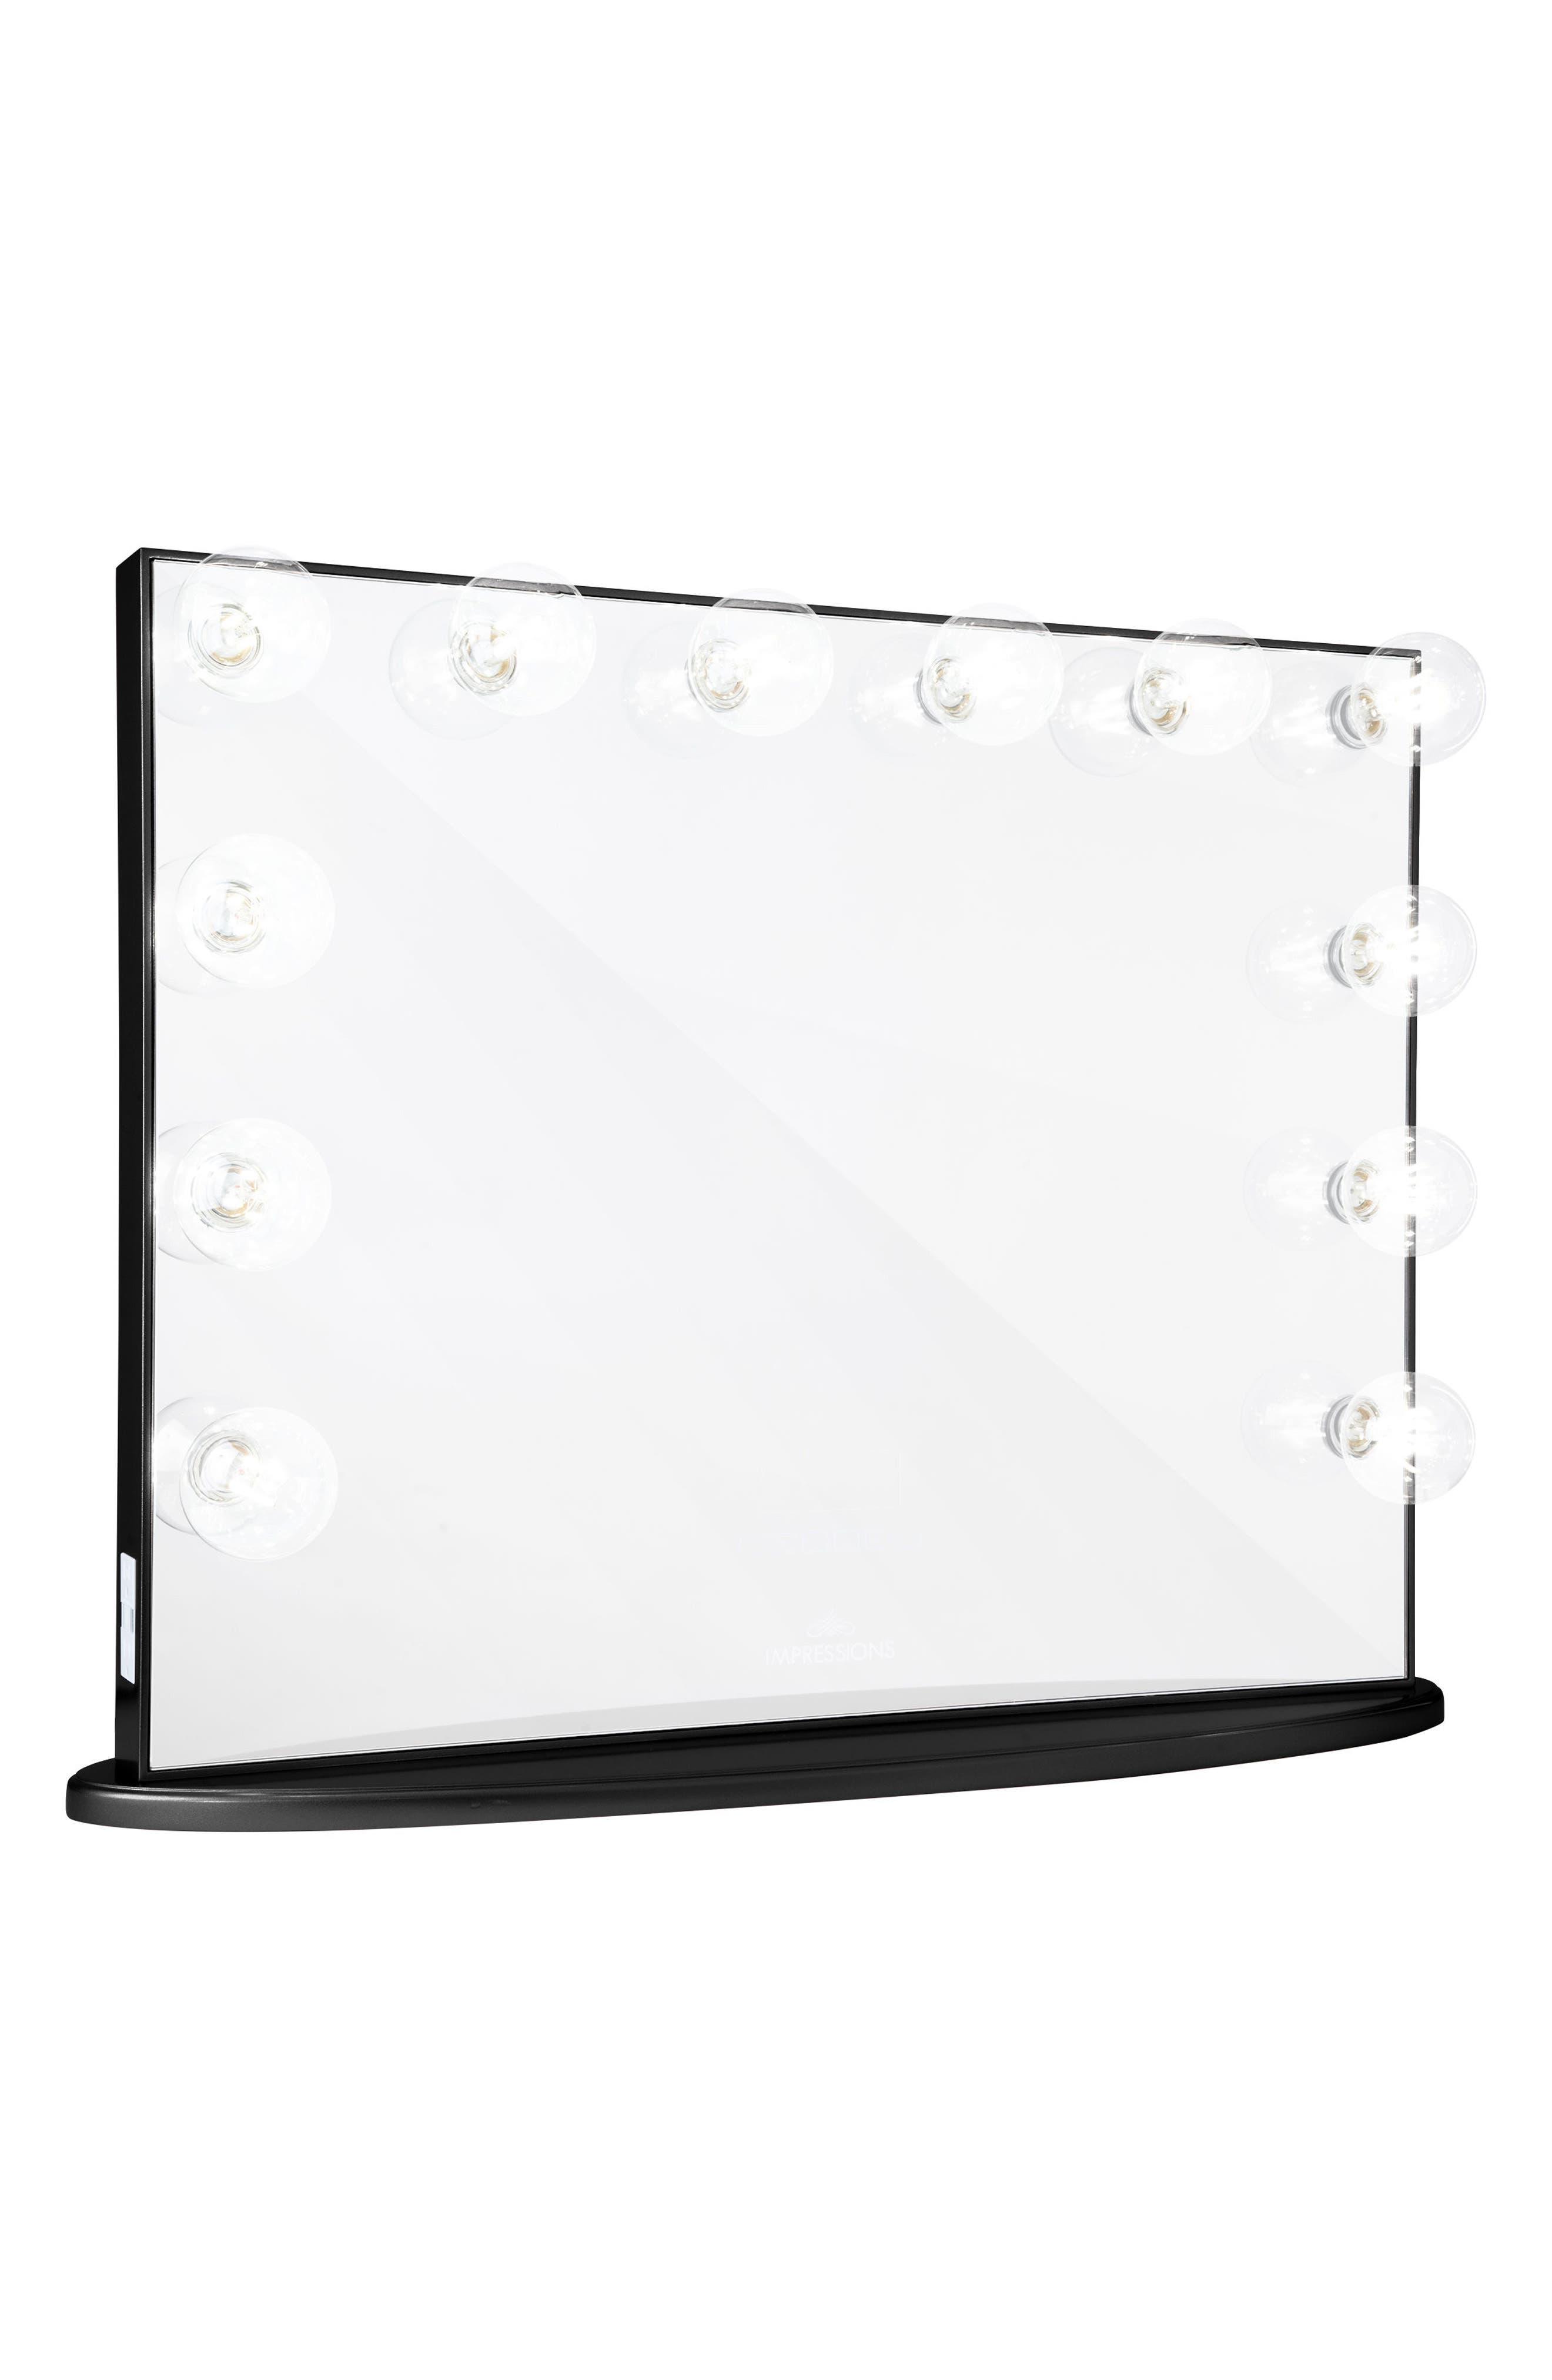 Main Image - Impressions Vanity Co. Hollywood Glow™ Plus LED Vanity Mirror